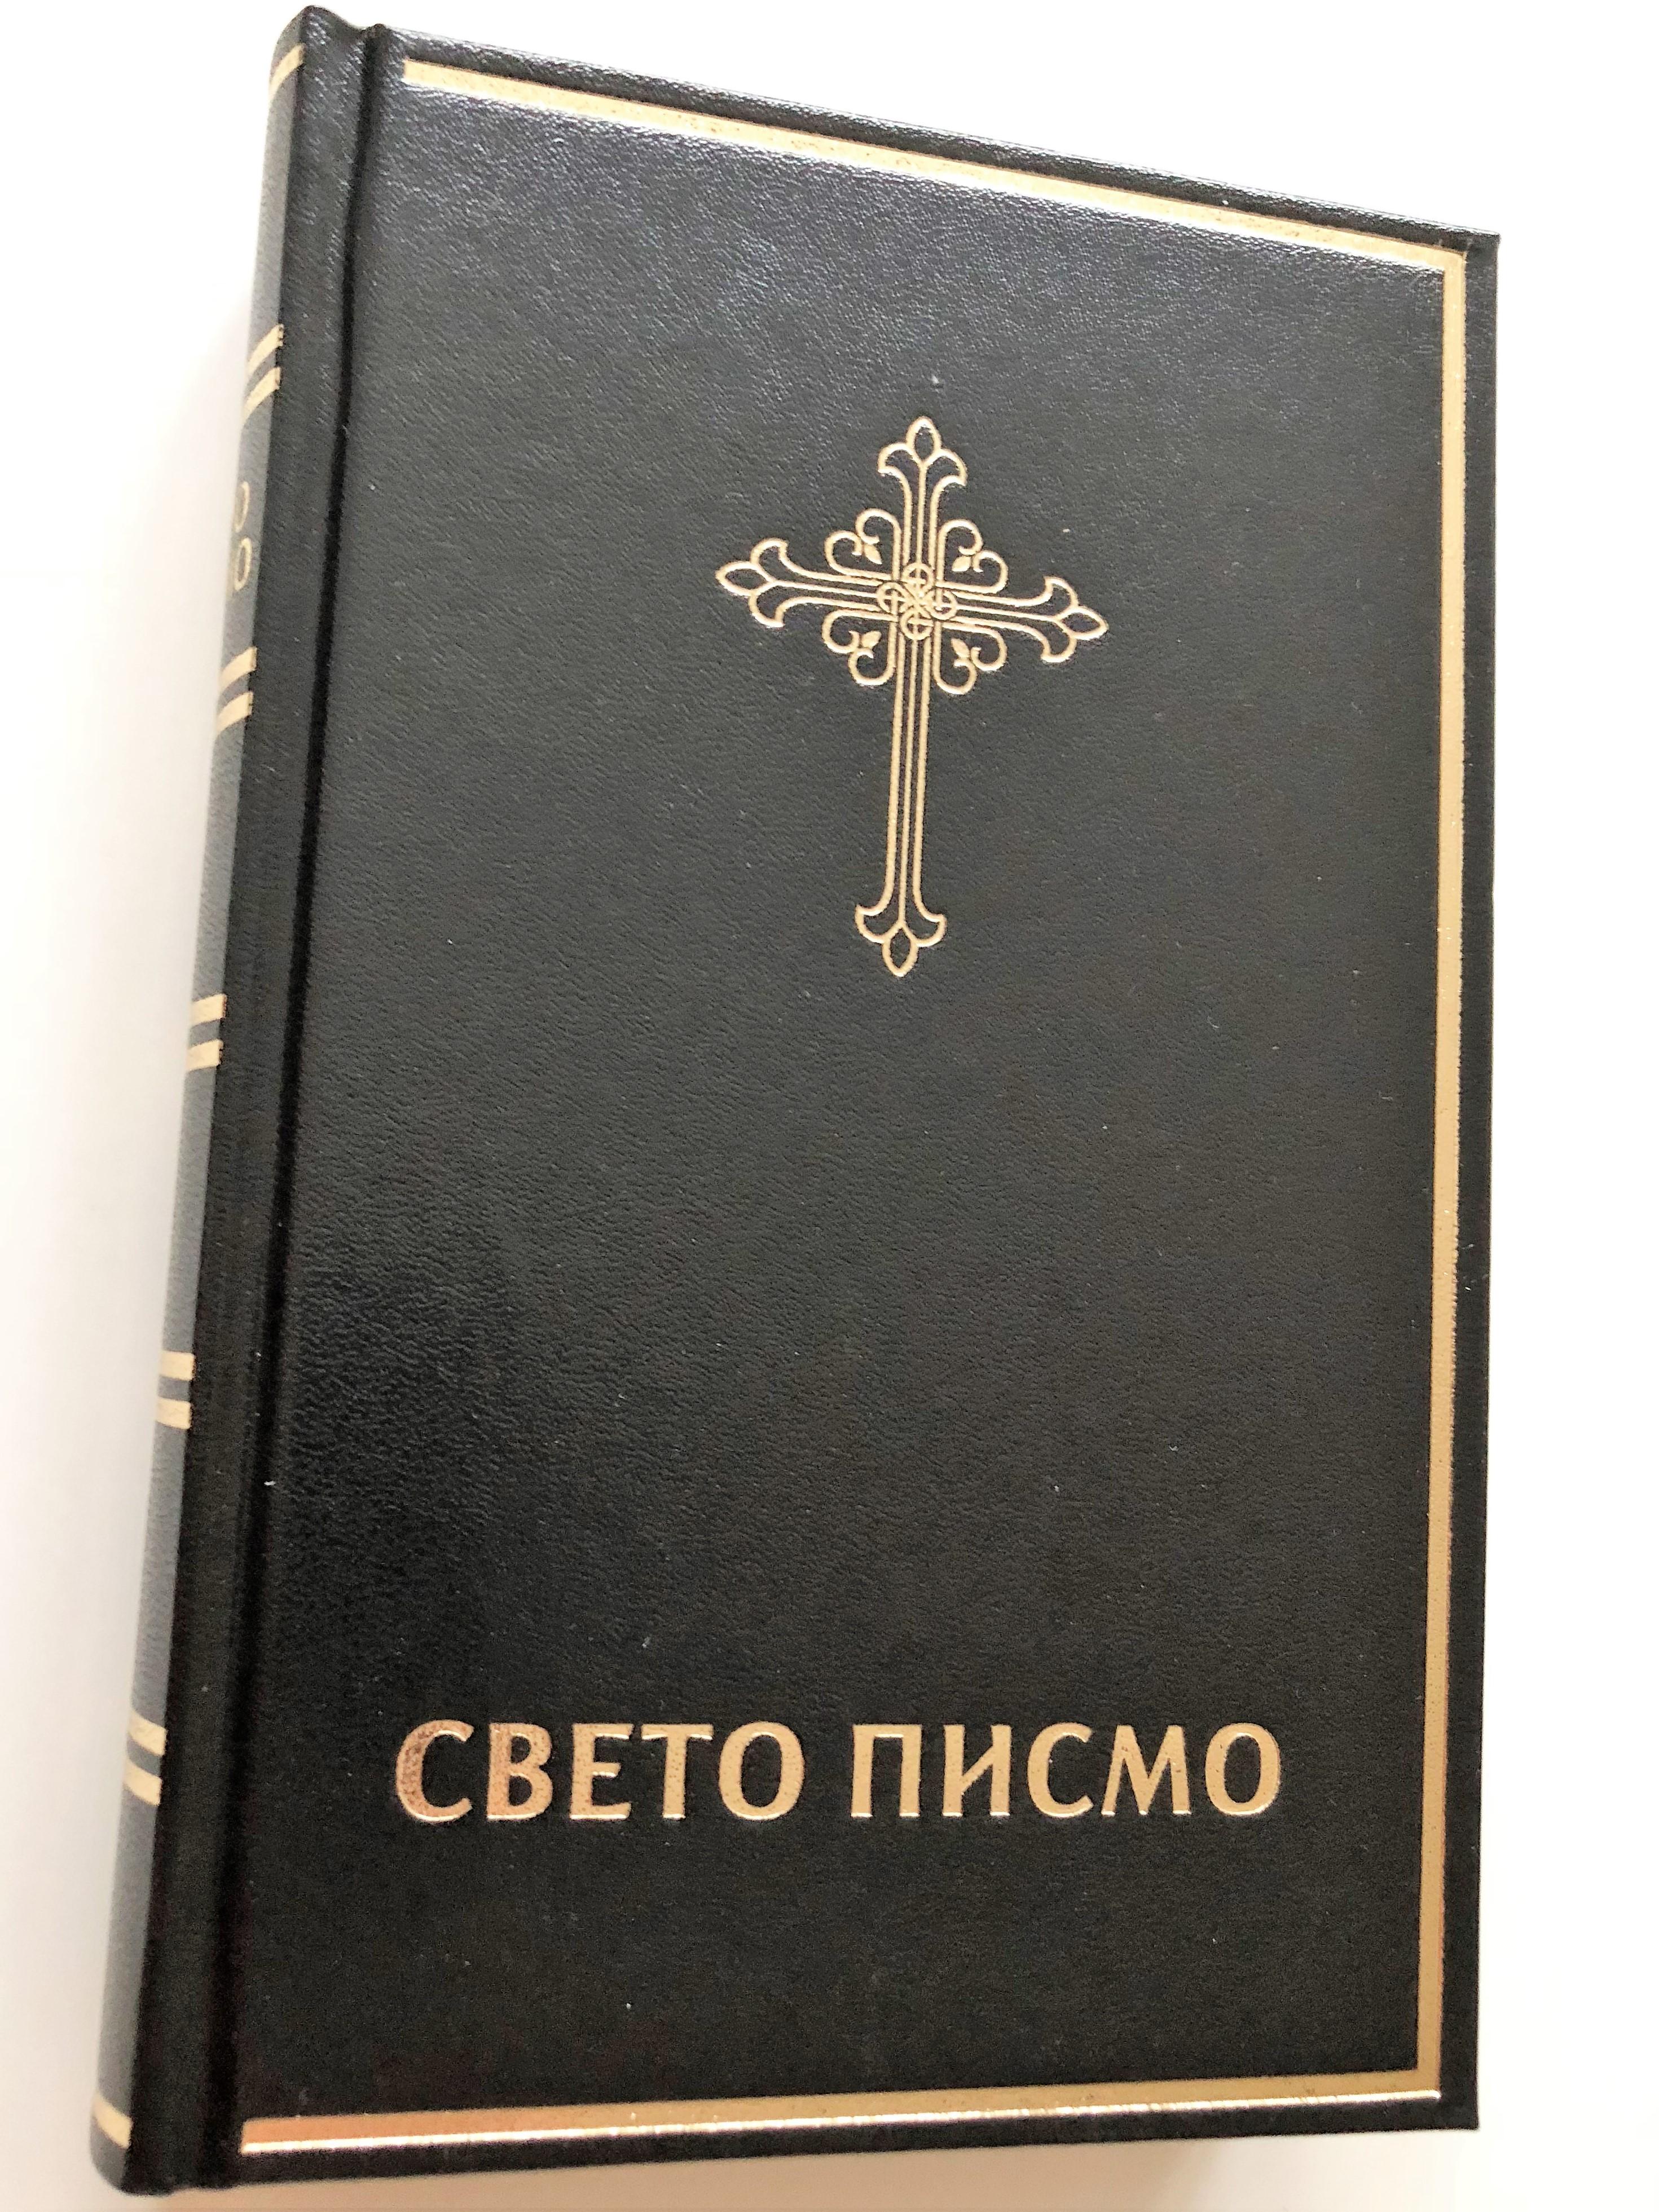 serbian-language-bible-burgundy-cover-with-golden-cross-cyrillic-script-043hs-23-.jpg